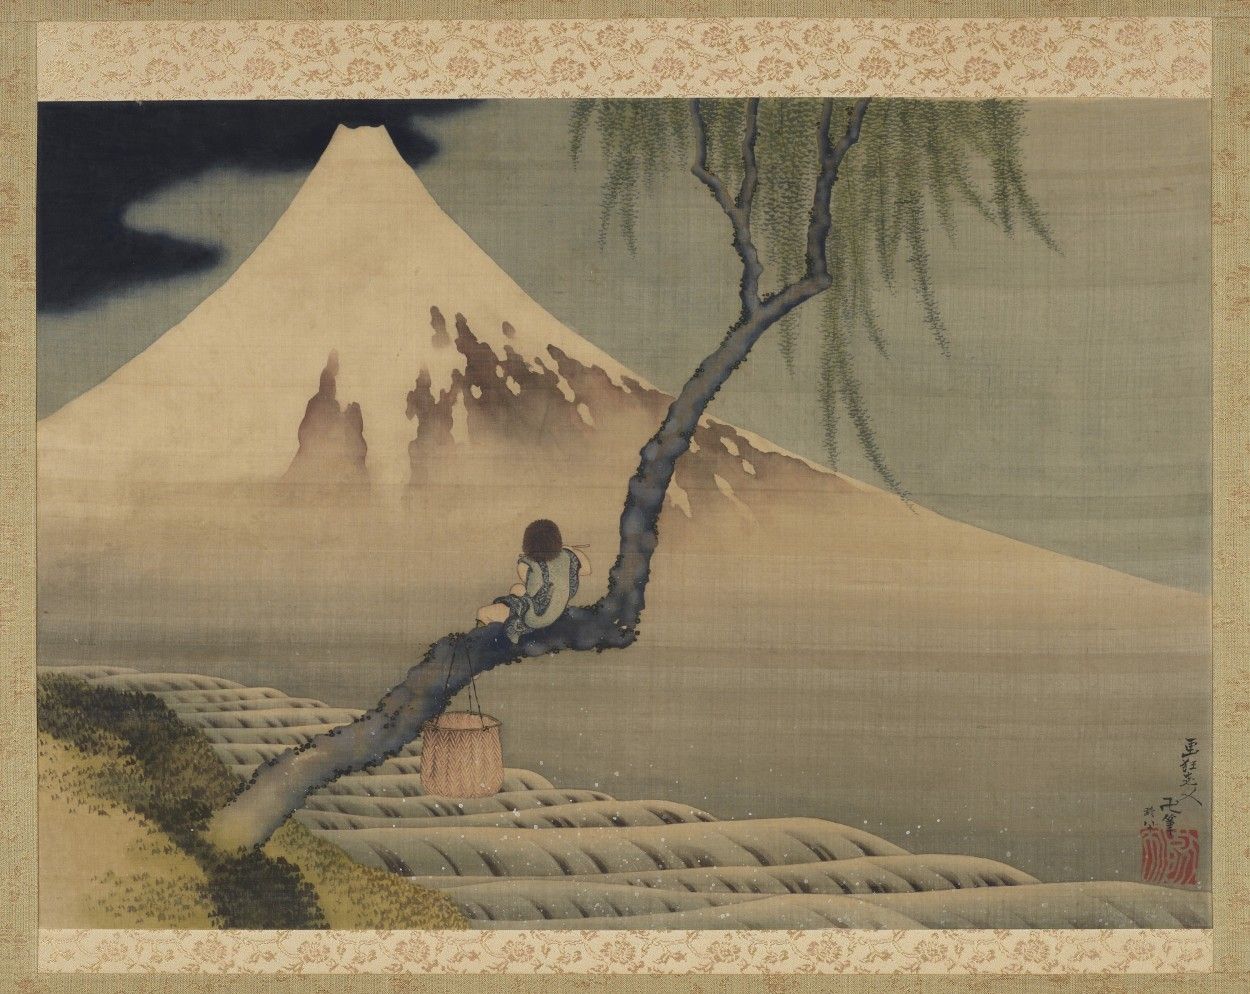 Boy Viewing Mount Fuji By Katsushika Hokusai Via Dailyart Mobile App